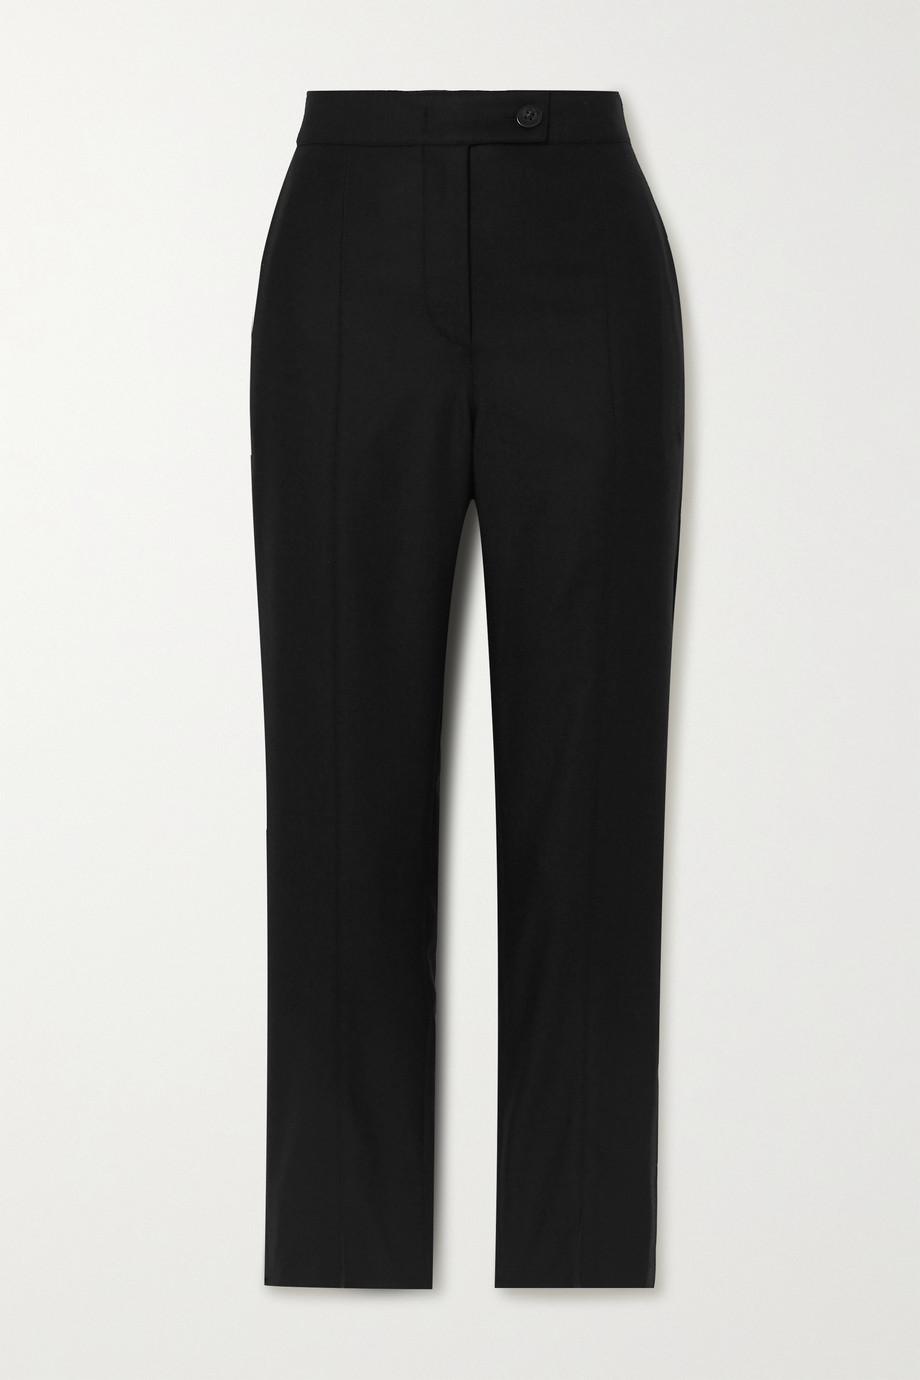 CASASOLA + NET SUSTAIN Milano wool and silk-blend skinny pants